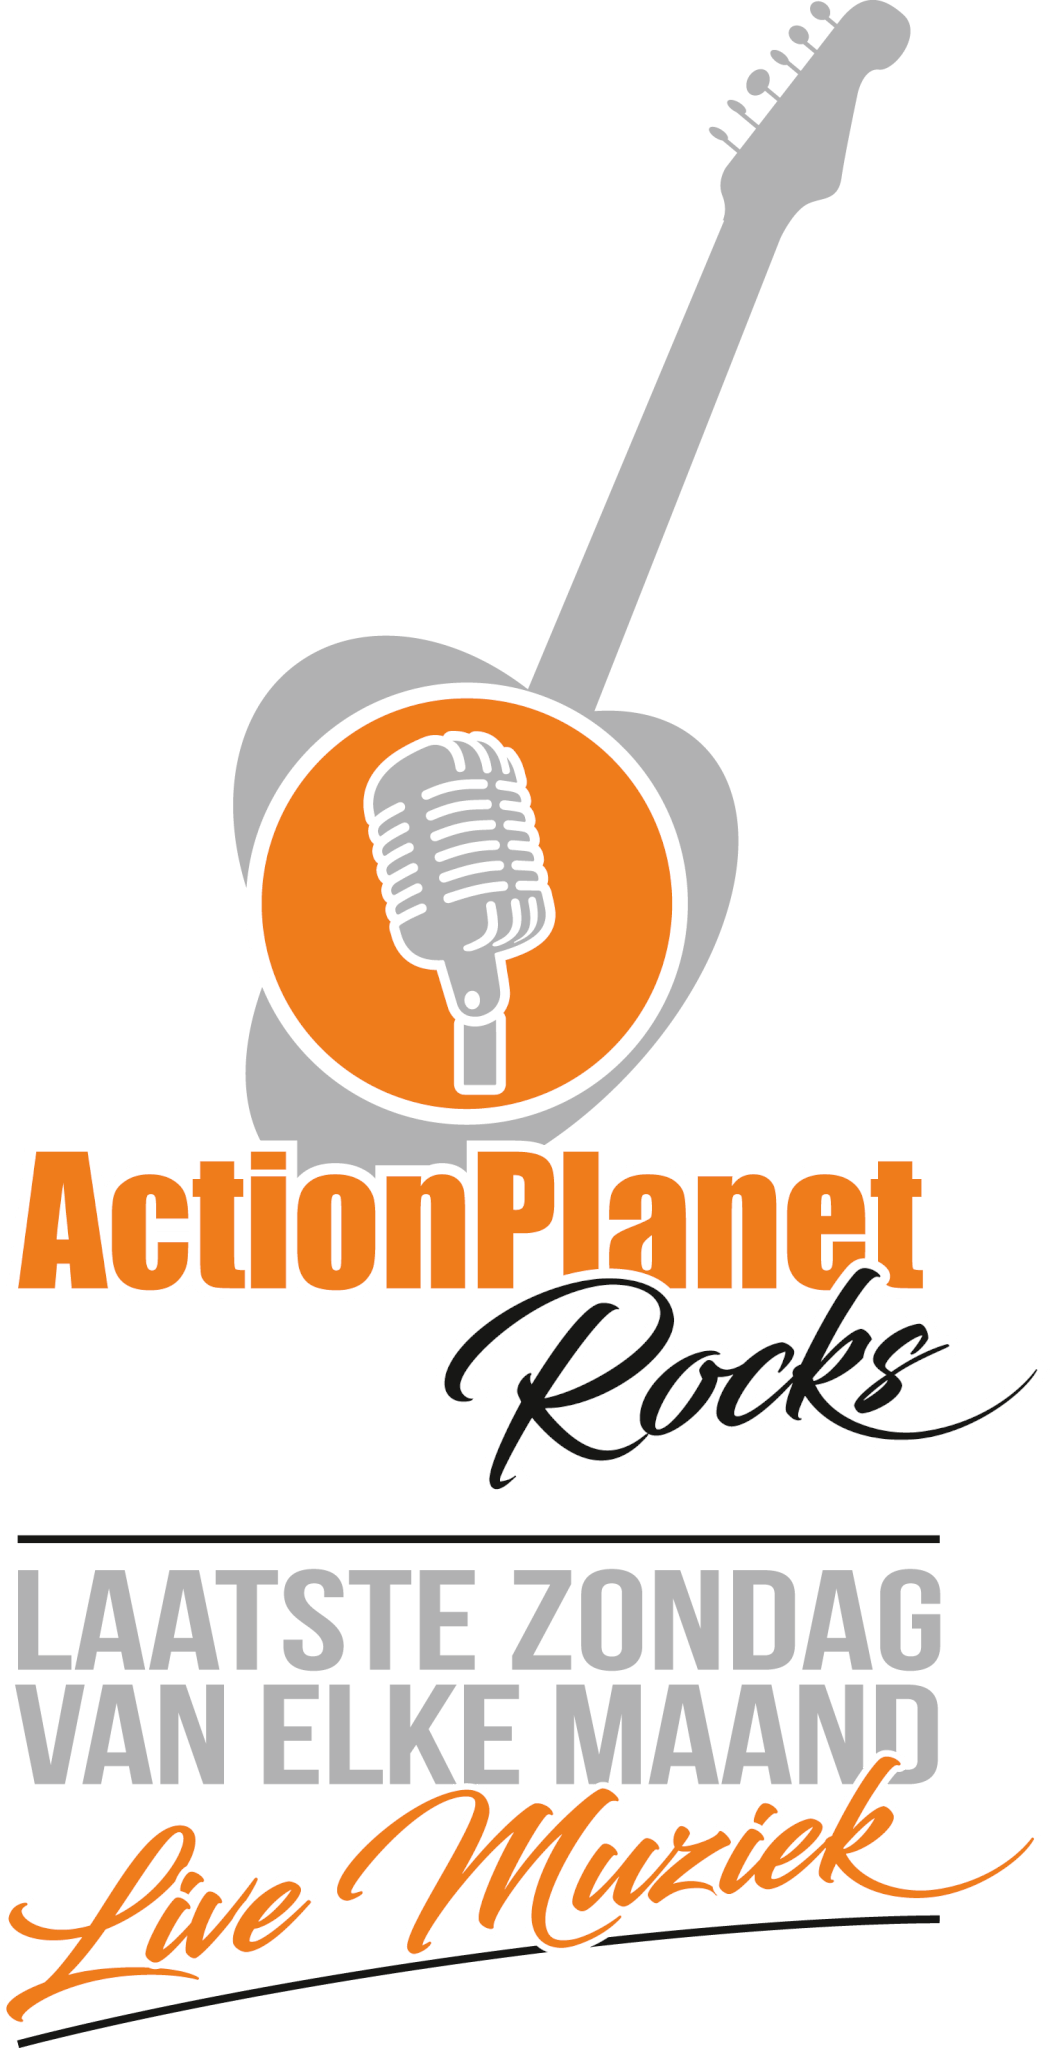 ActionPlanet Rocks! 1